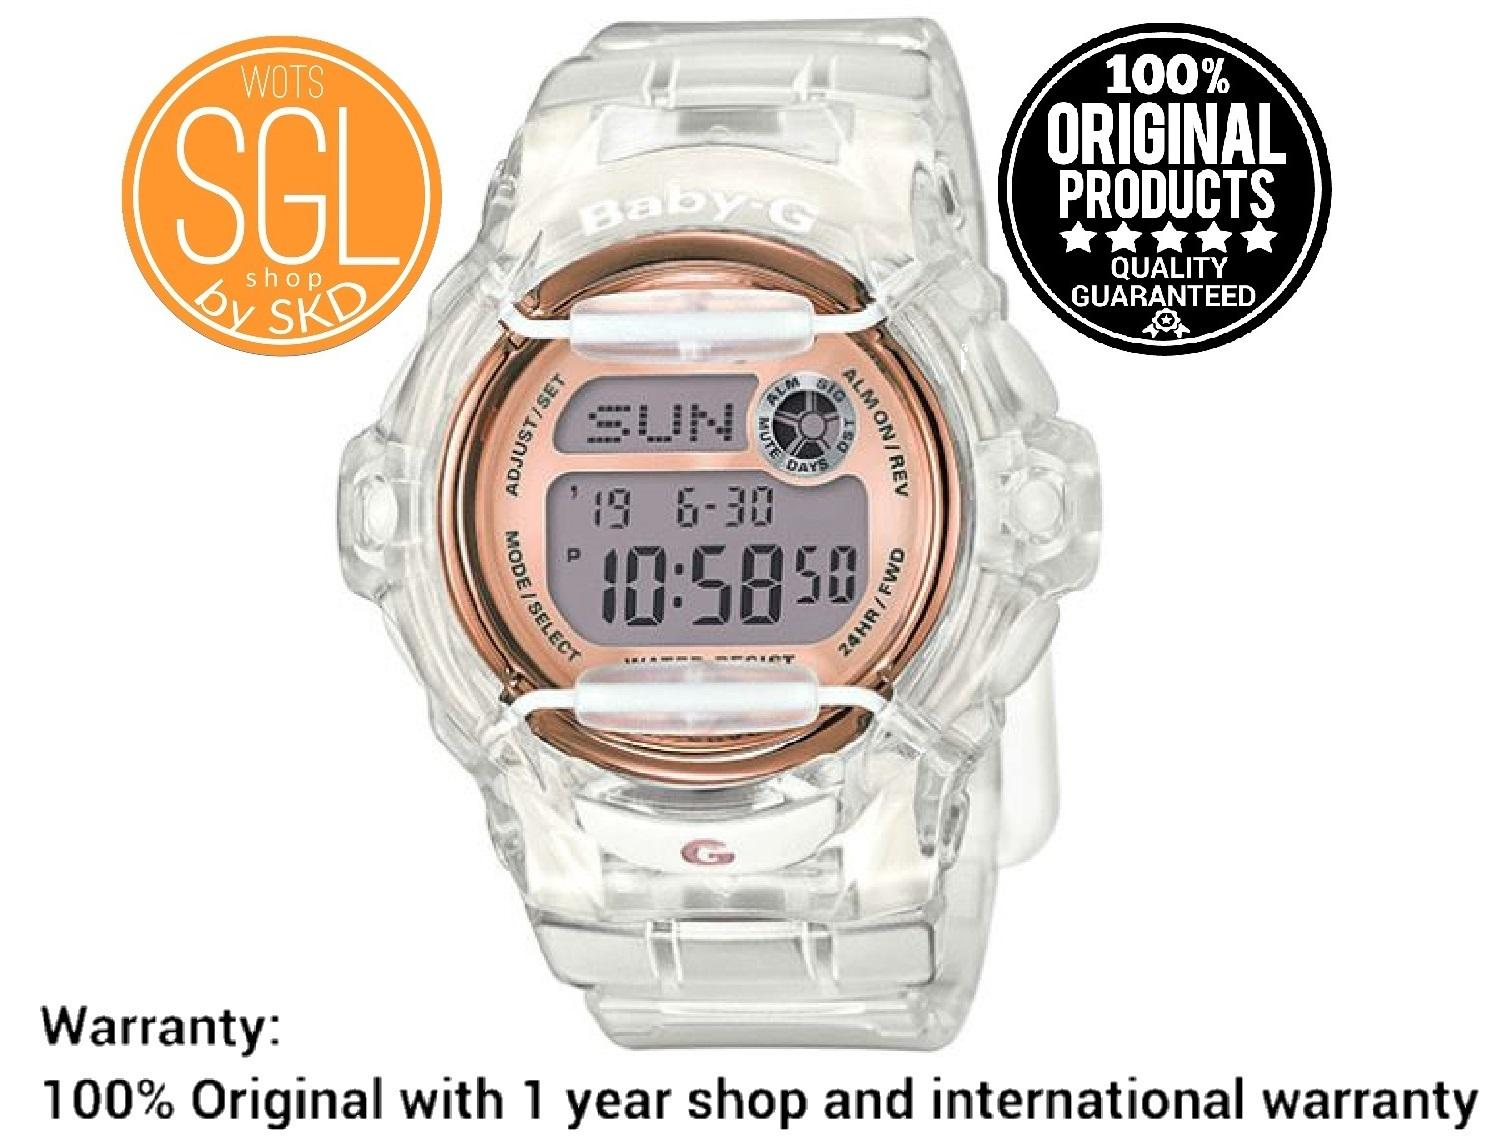 Casio Baby G Philippines Price List Jam Tangan Cewek Bga 180 3b Original Digital Watch Transparent Band Bg169g 7b Sgl Wots Shop